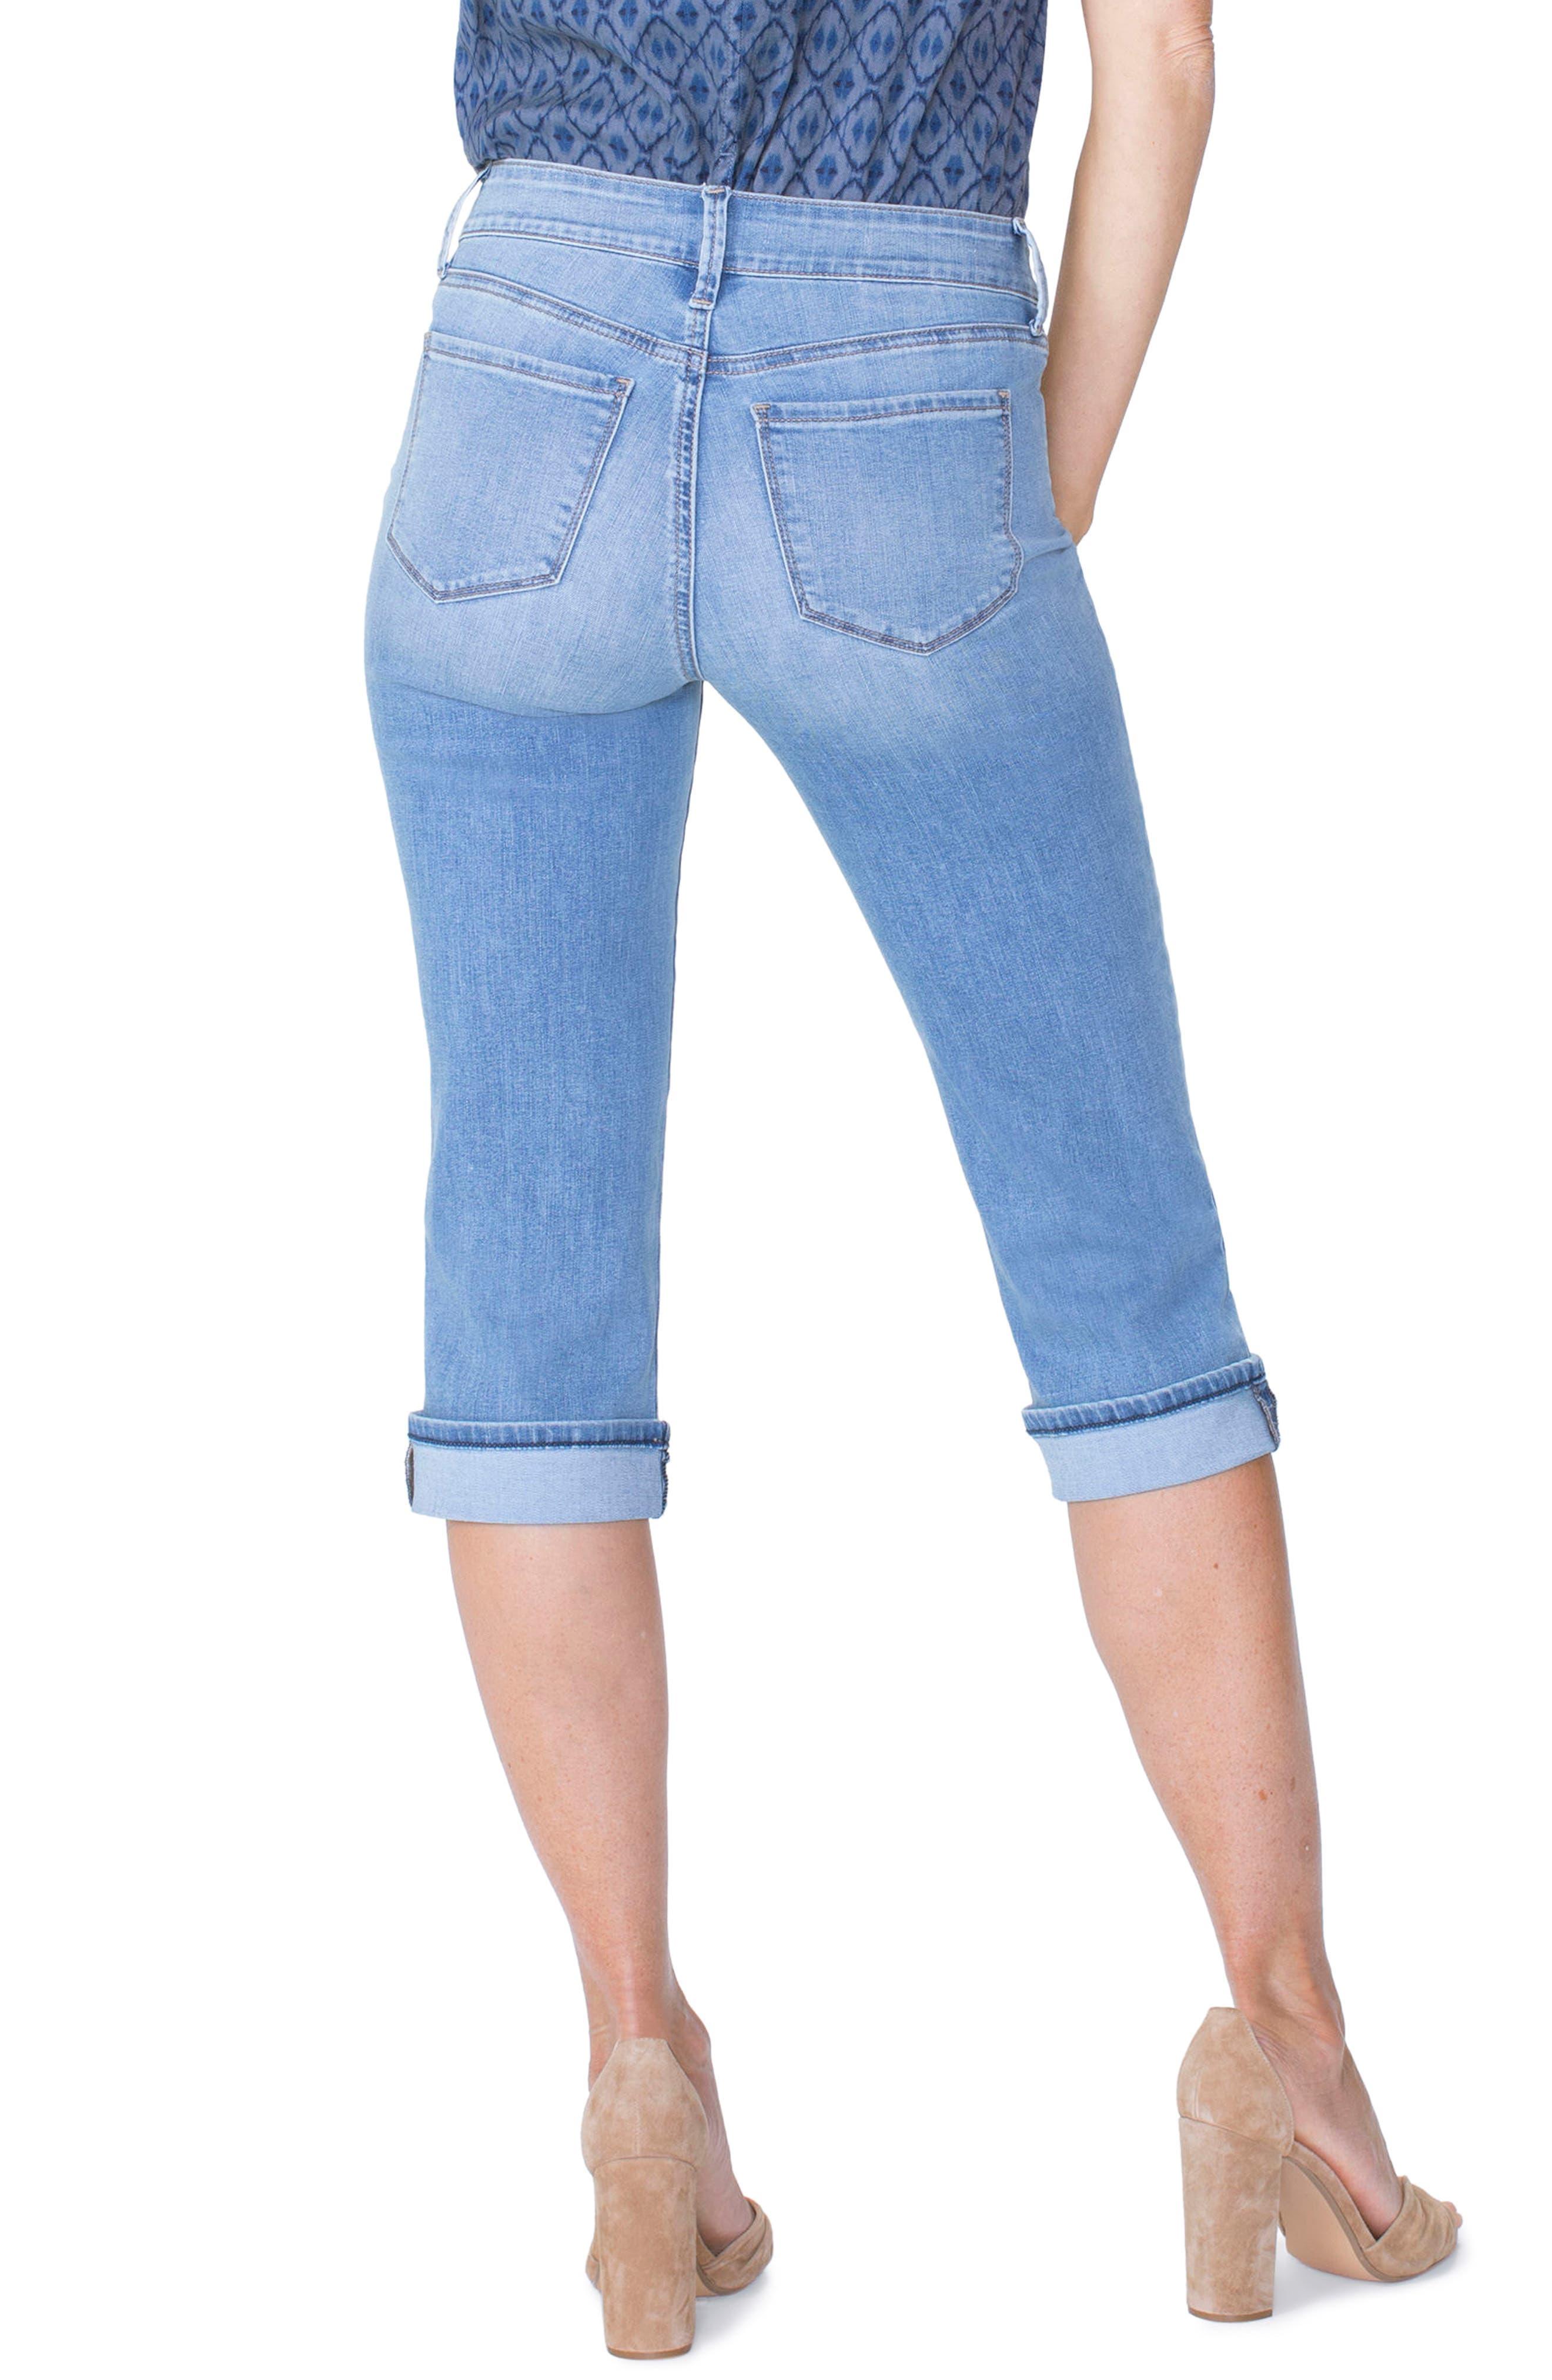 Marilyn High Waist Cuffed Stretch Crop Jeans,                             Alternate thumbnail 2, color,                             PAMPELONNE